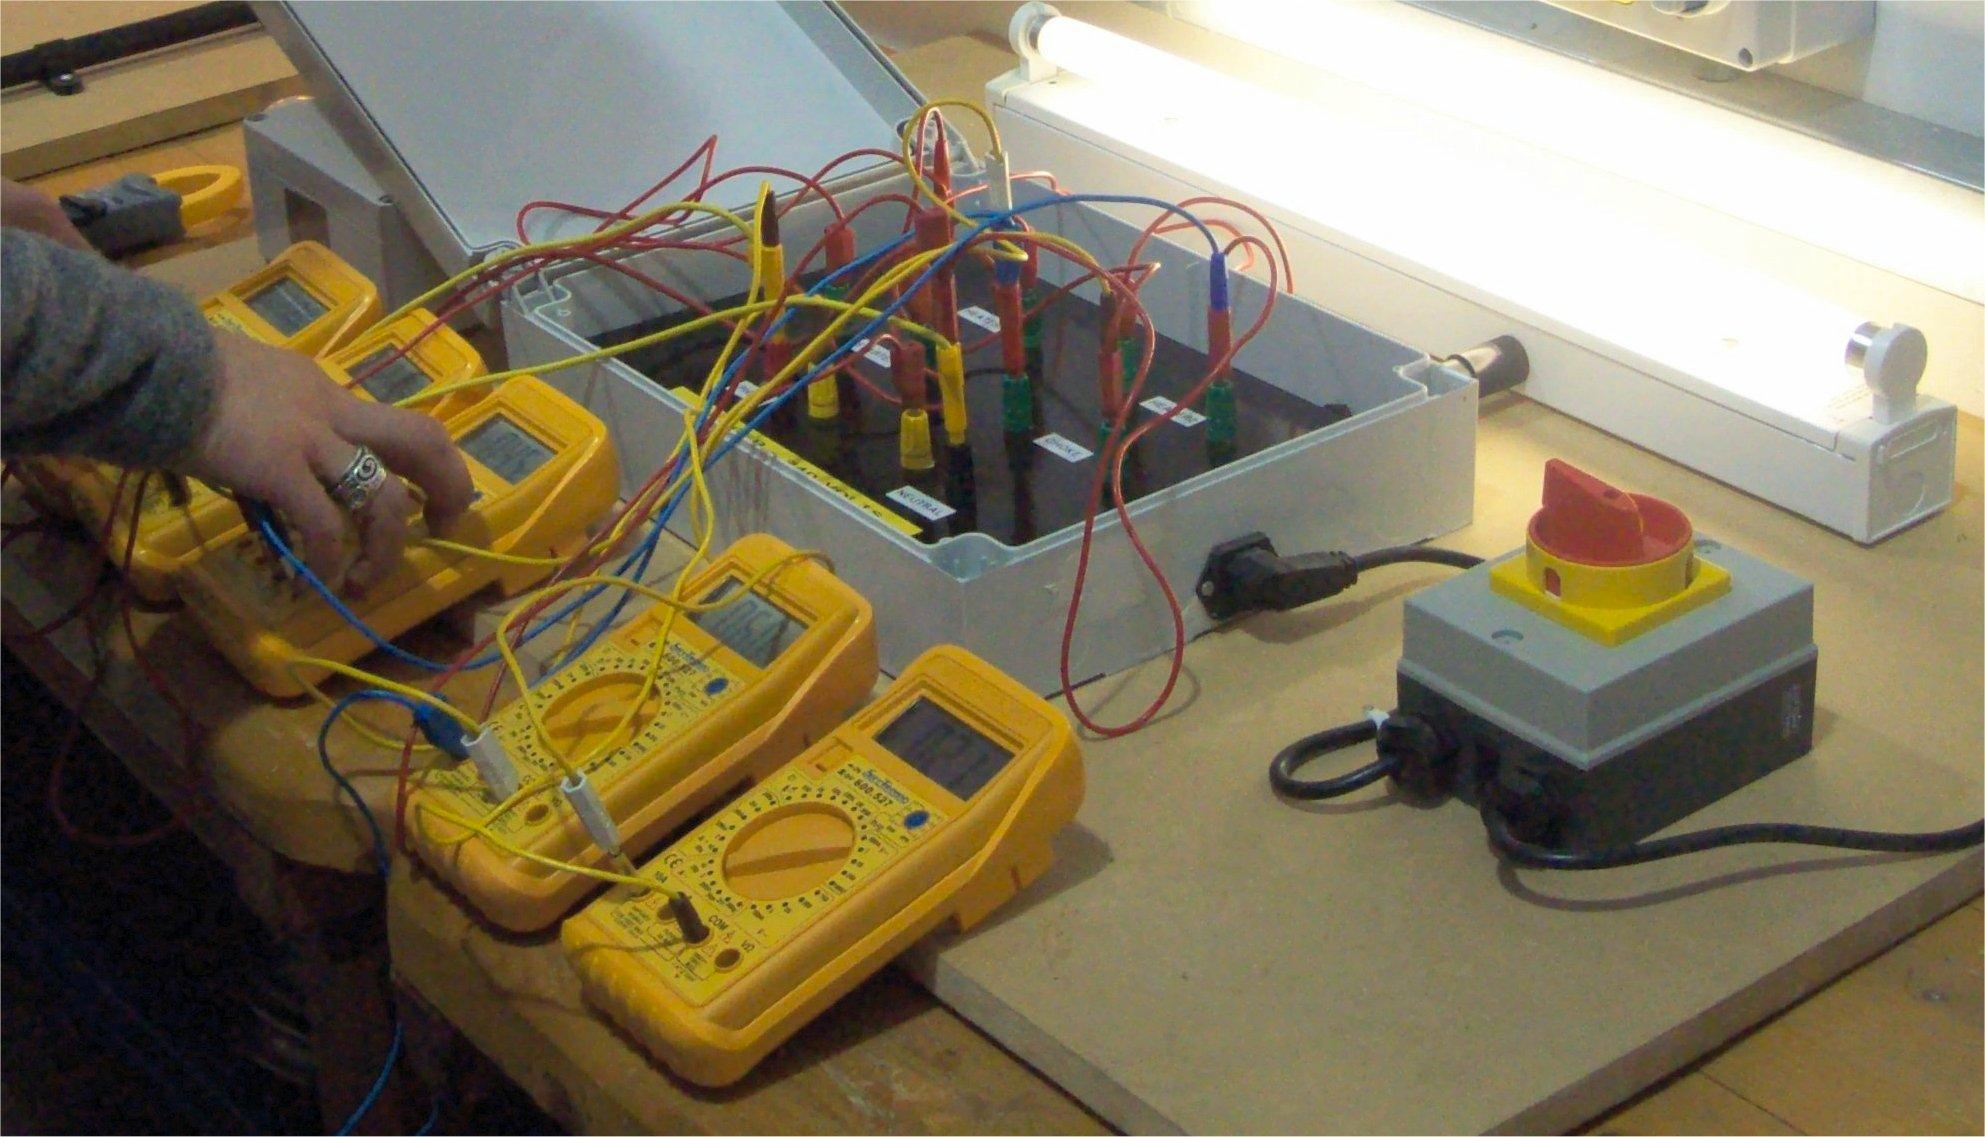 Electrical Circuit Installation - Merzie.net